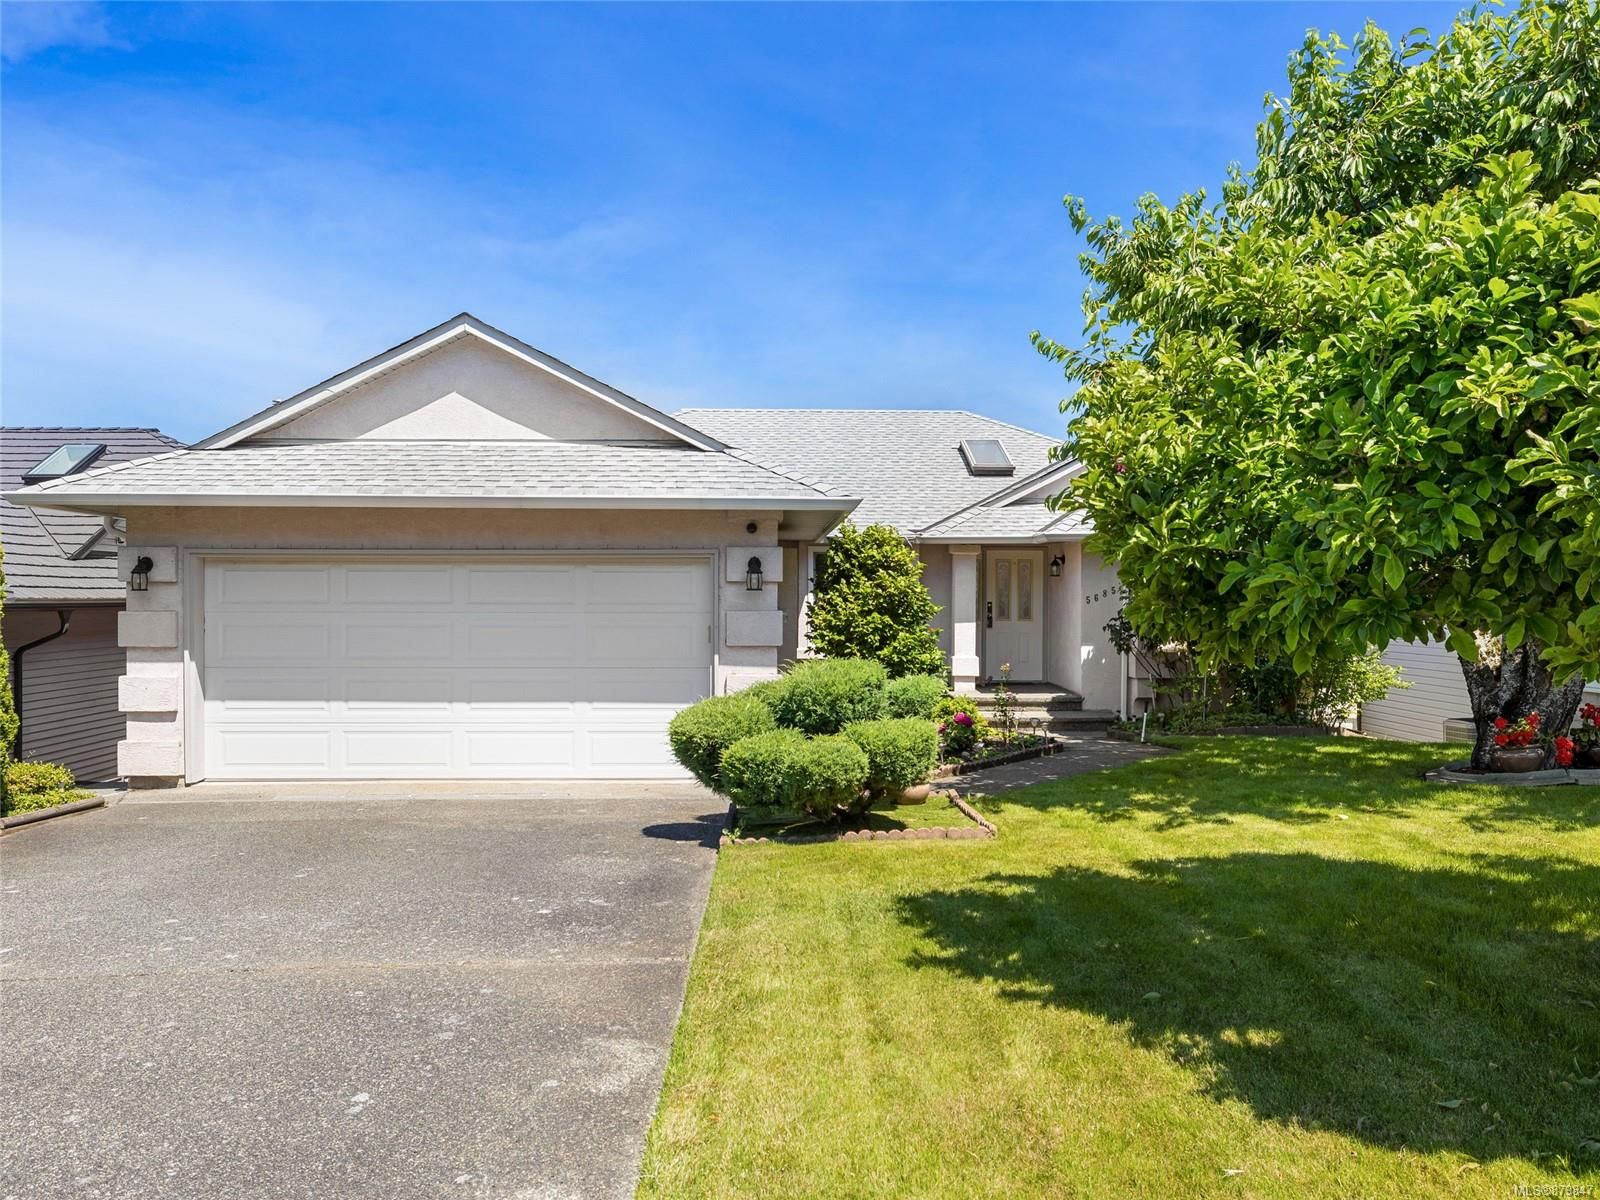 Main Photo: 5685 Carrington Rd in Nanaimo: Na North Nanaimo House for sale : MLS®# 879847